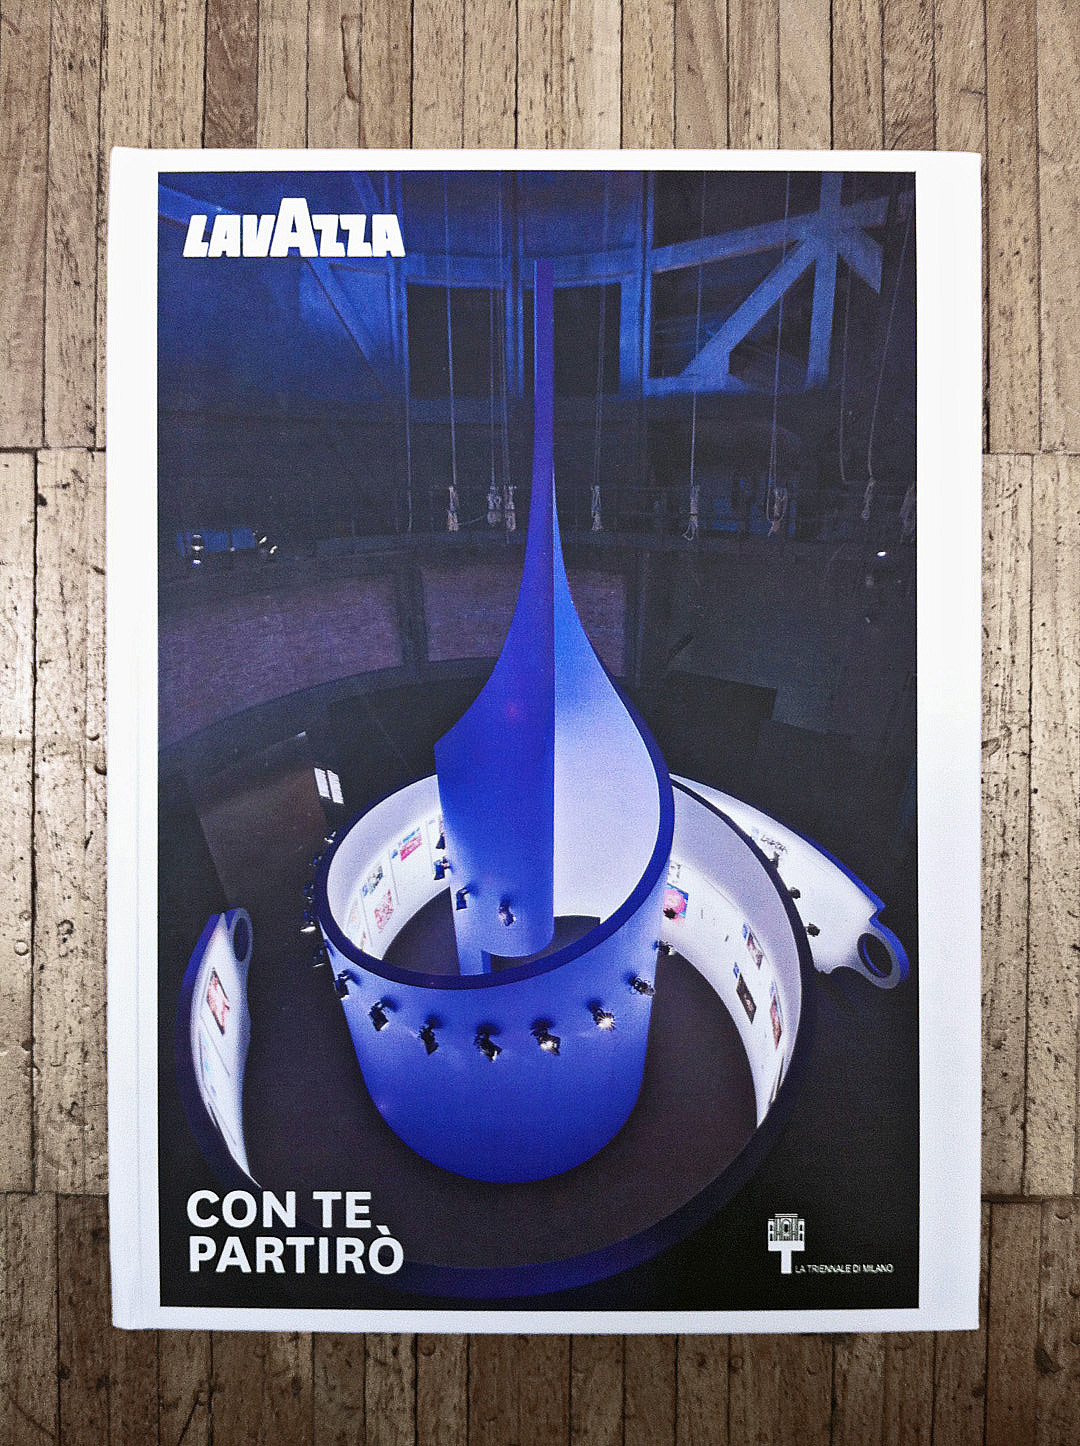 Lavazza_01.jpg